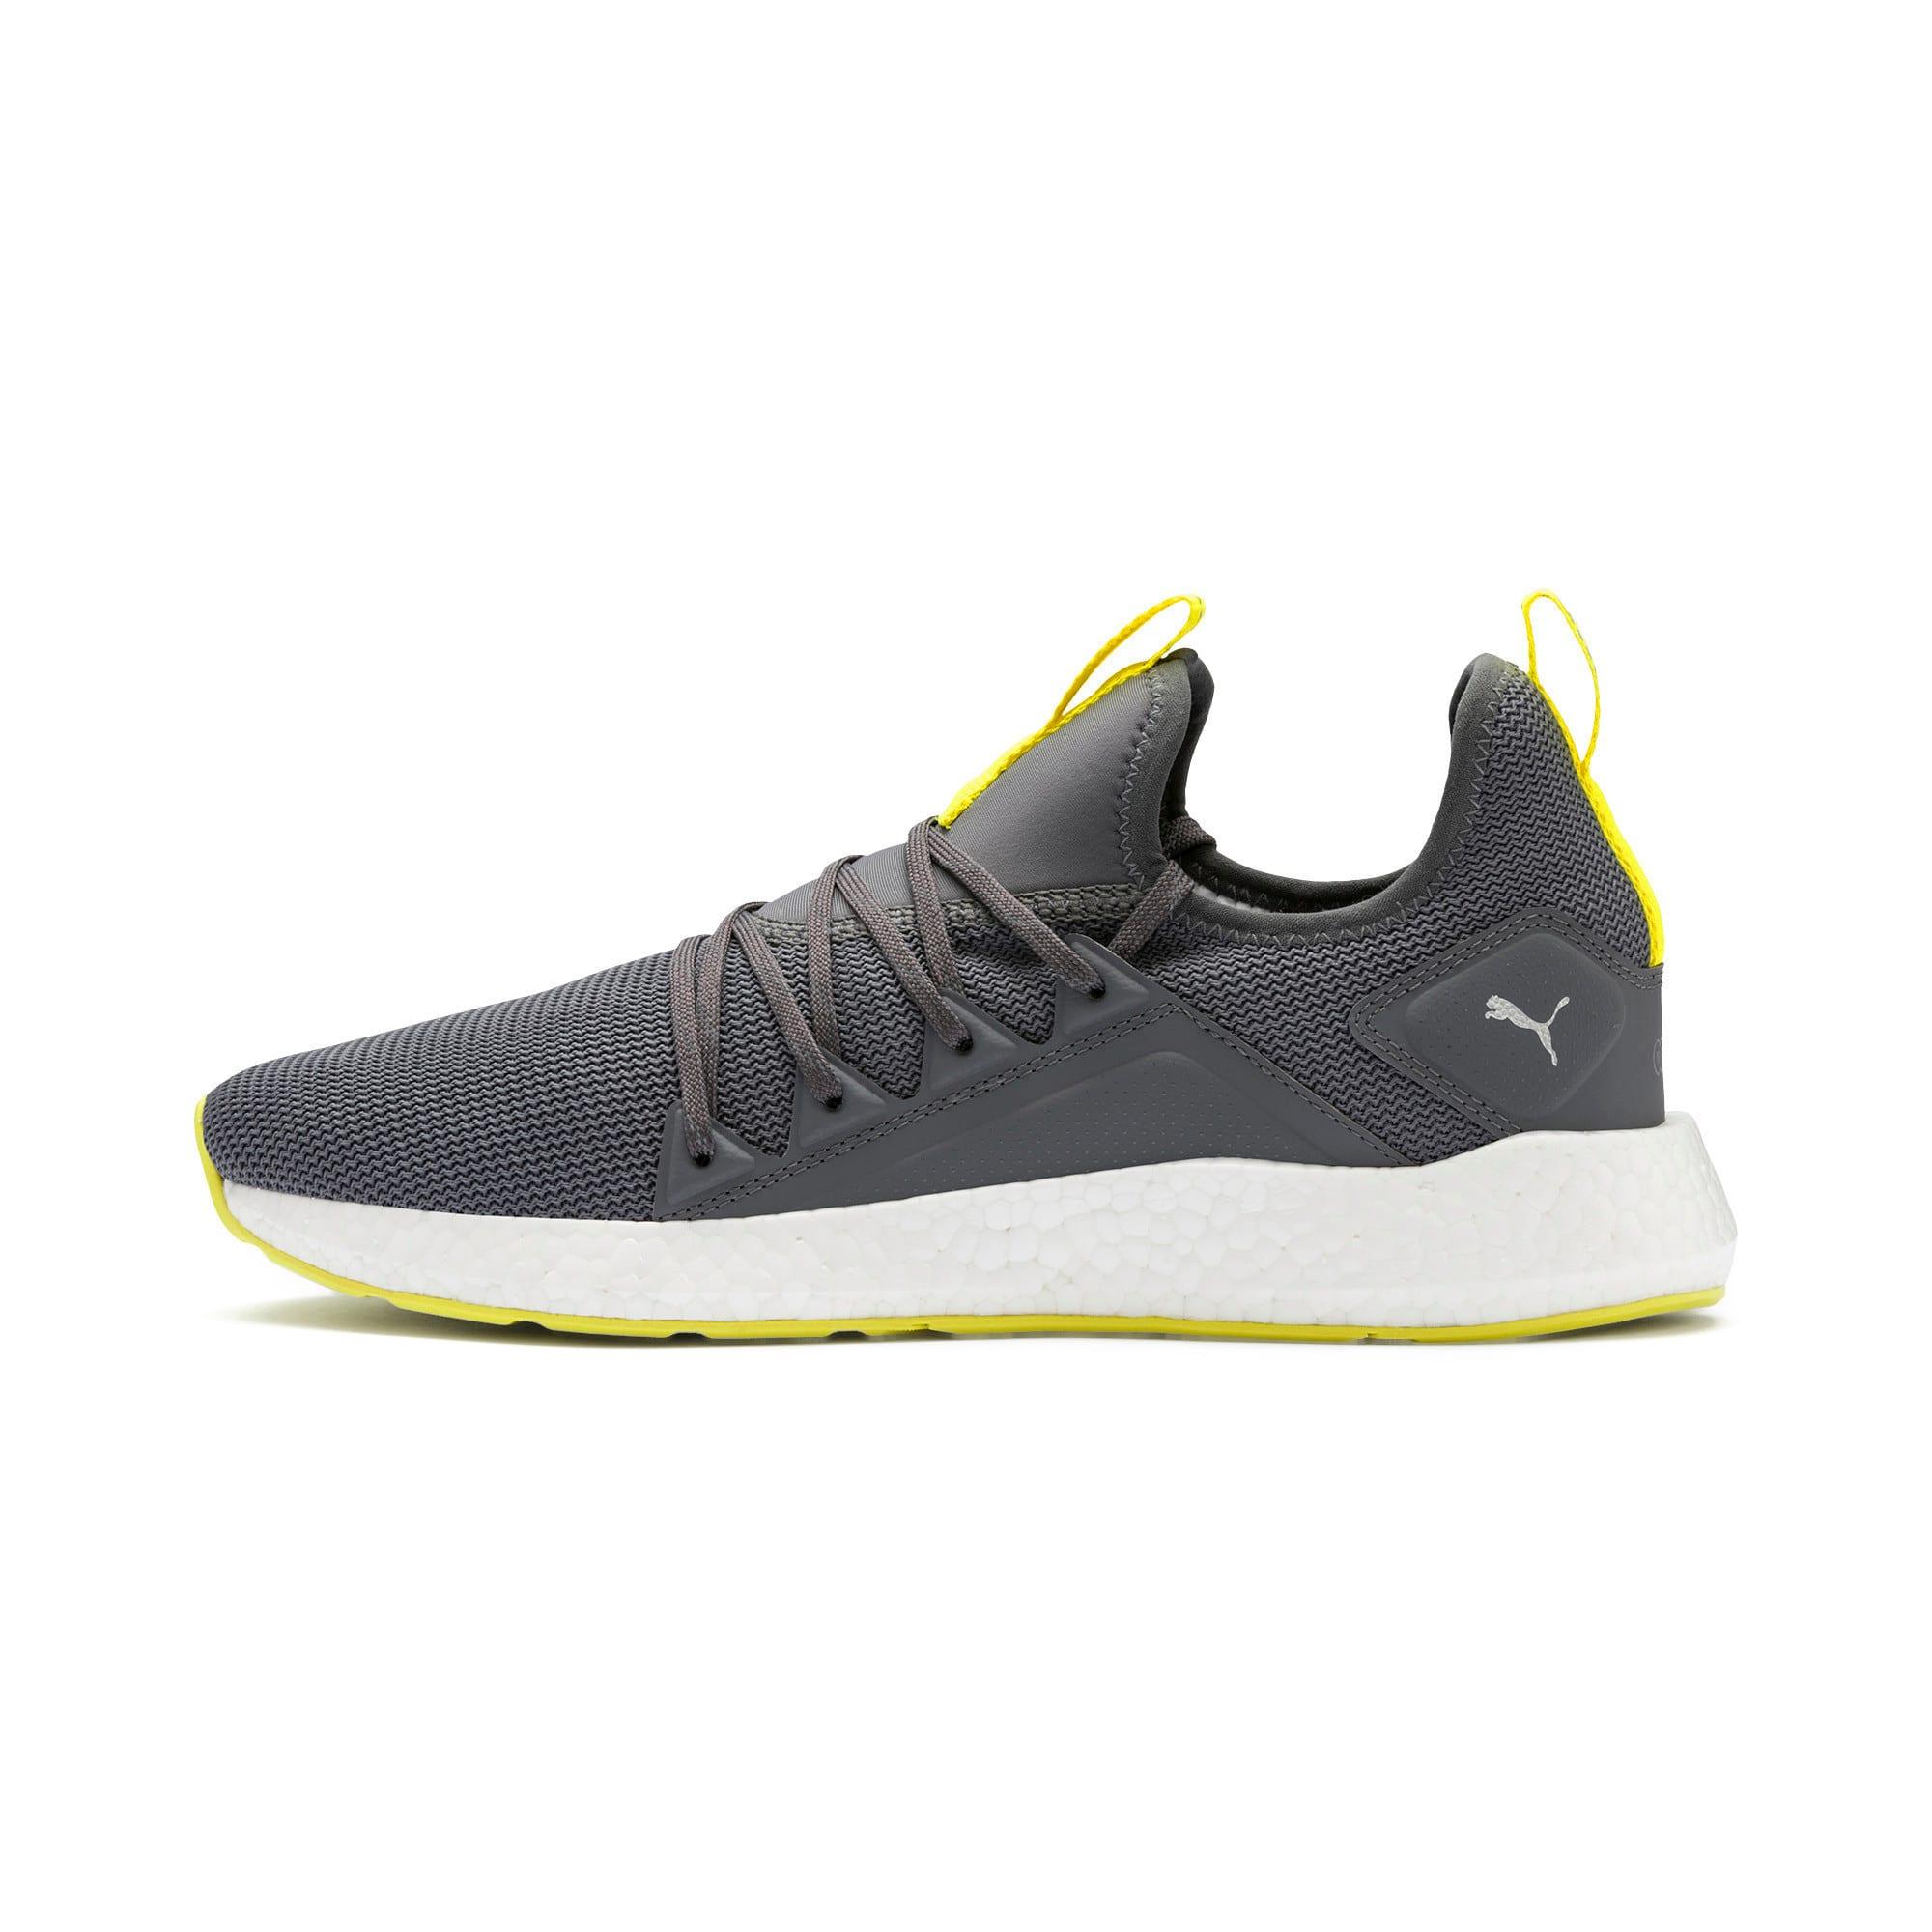 Thumbnail 1 of NRGY Neko Lights Men's Running Shoes, CASTLEROCK-Yellow Alert, medium-IND